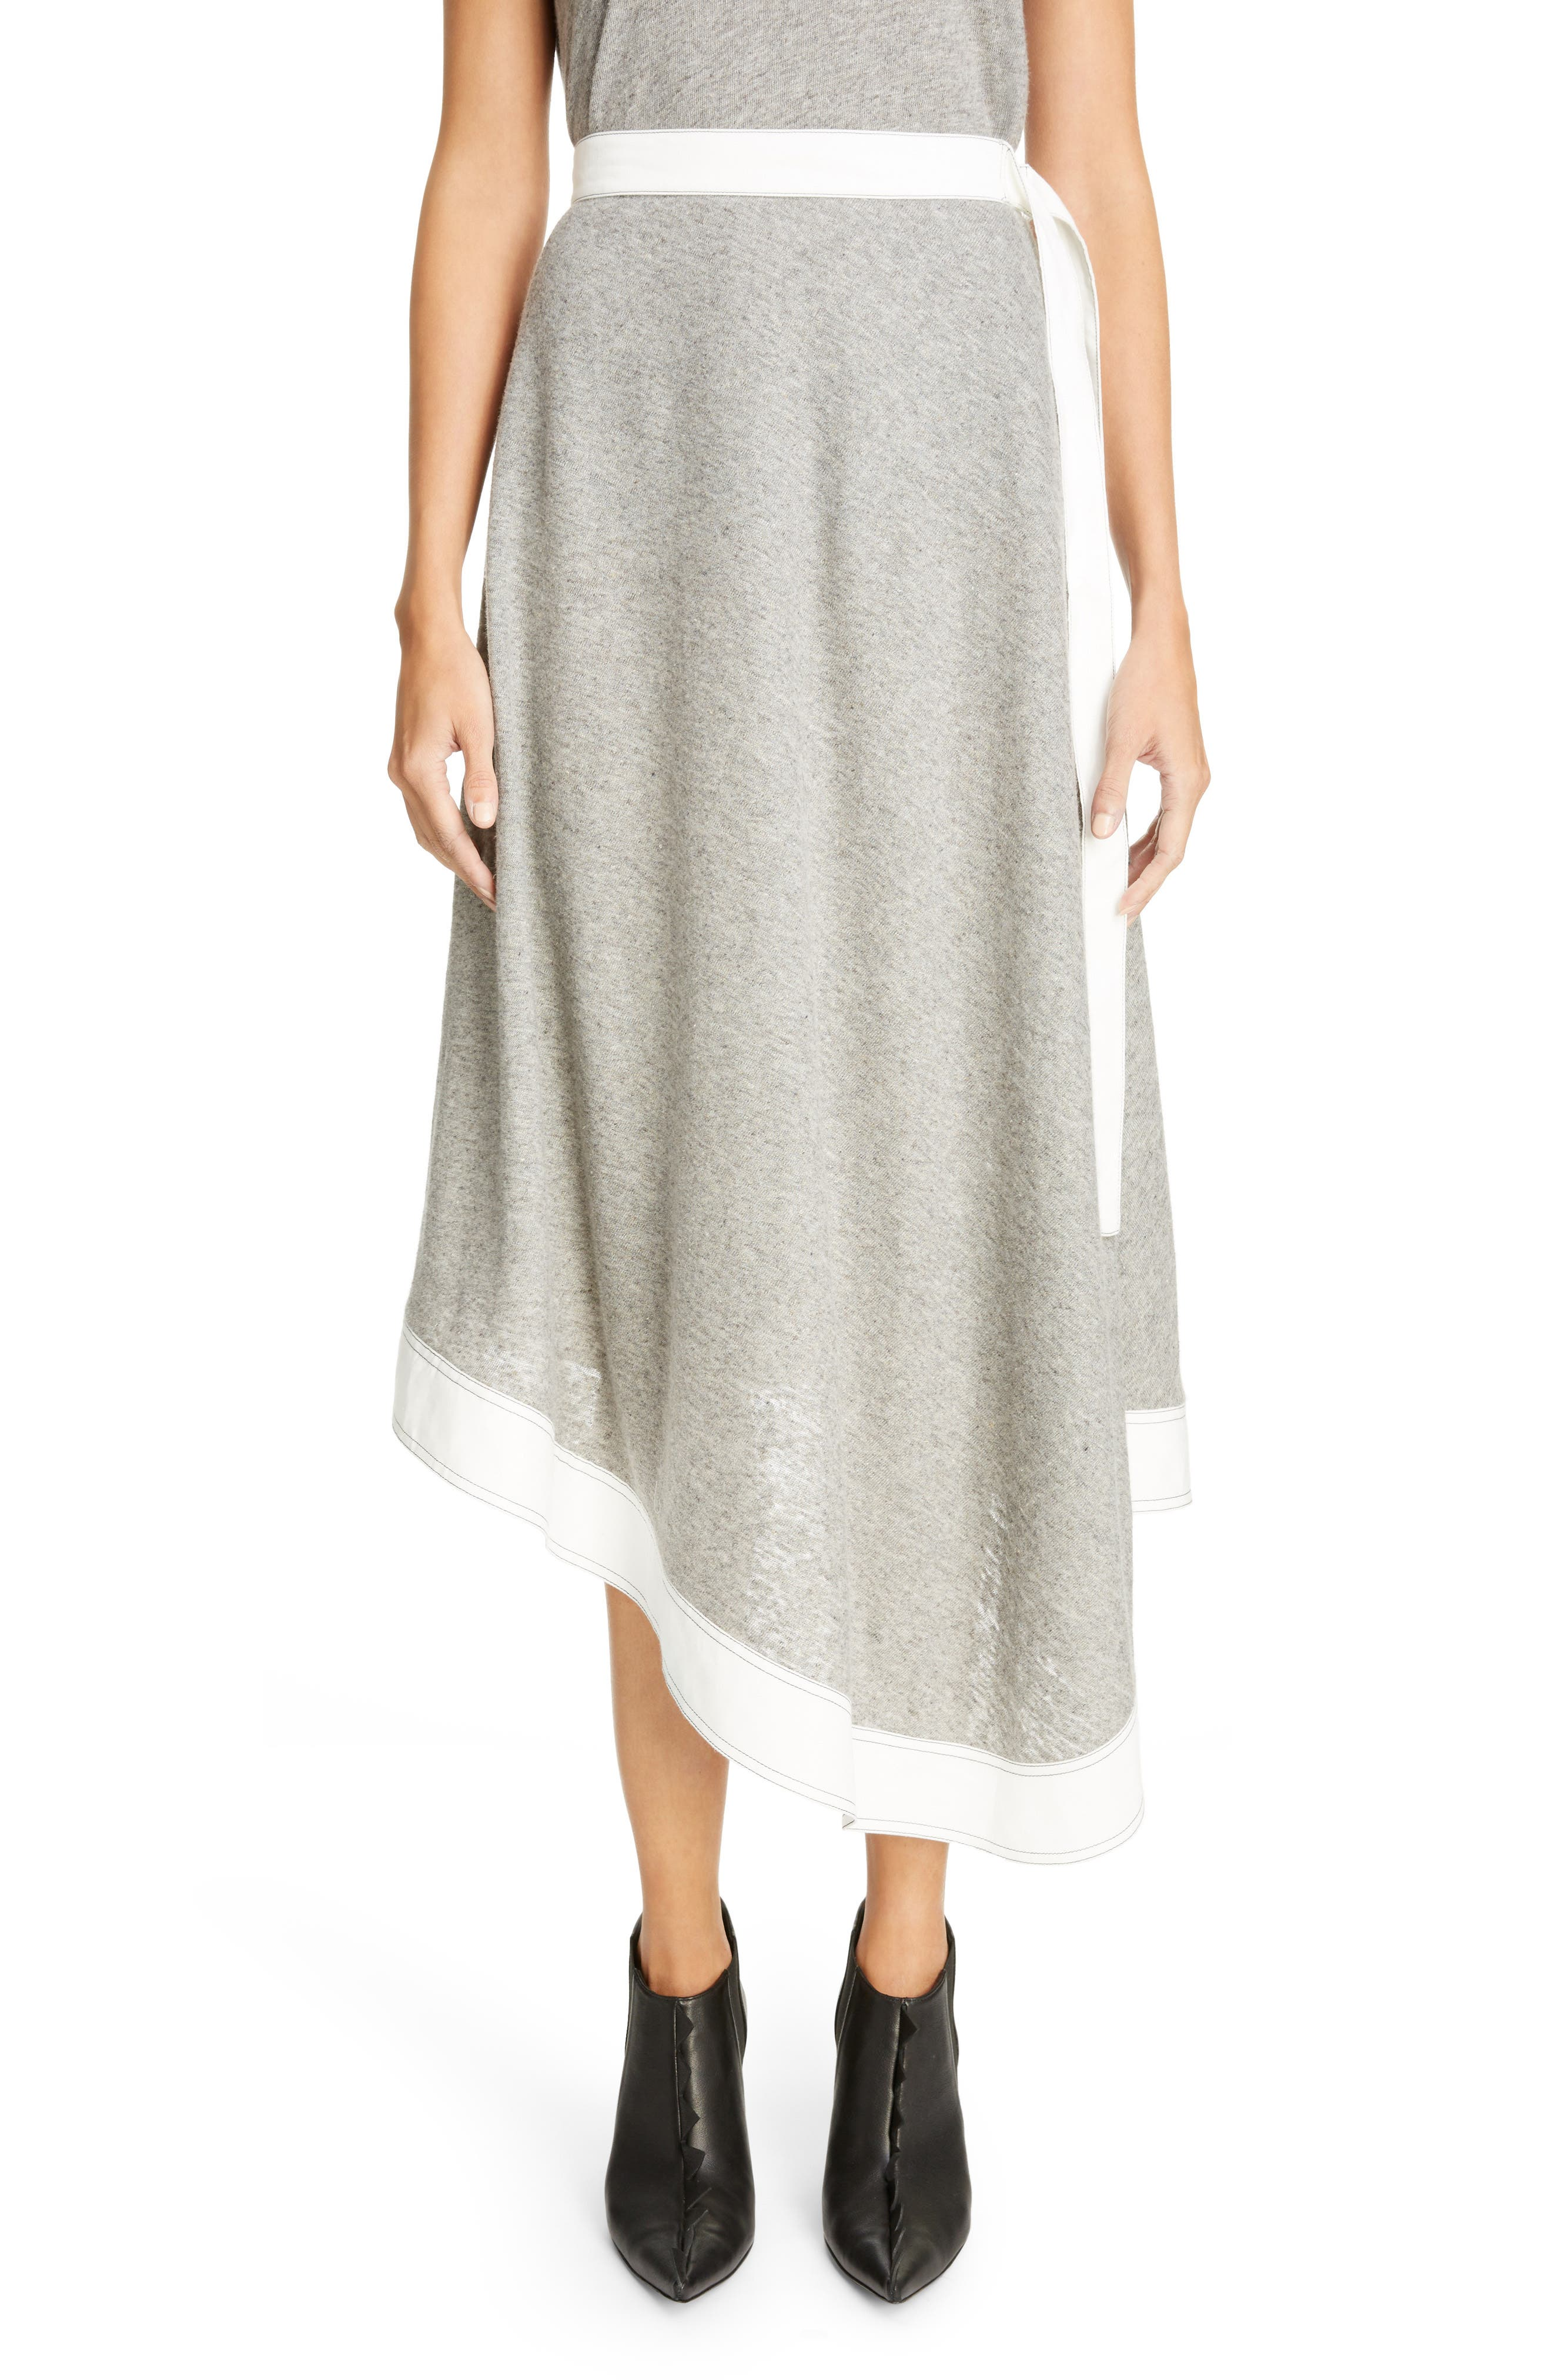 Loewe Asymmetrical Linen Blend Skirt